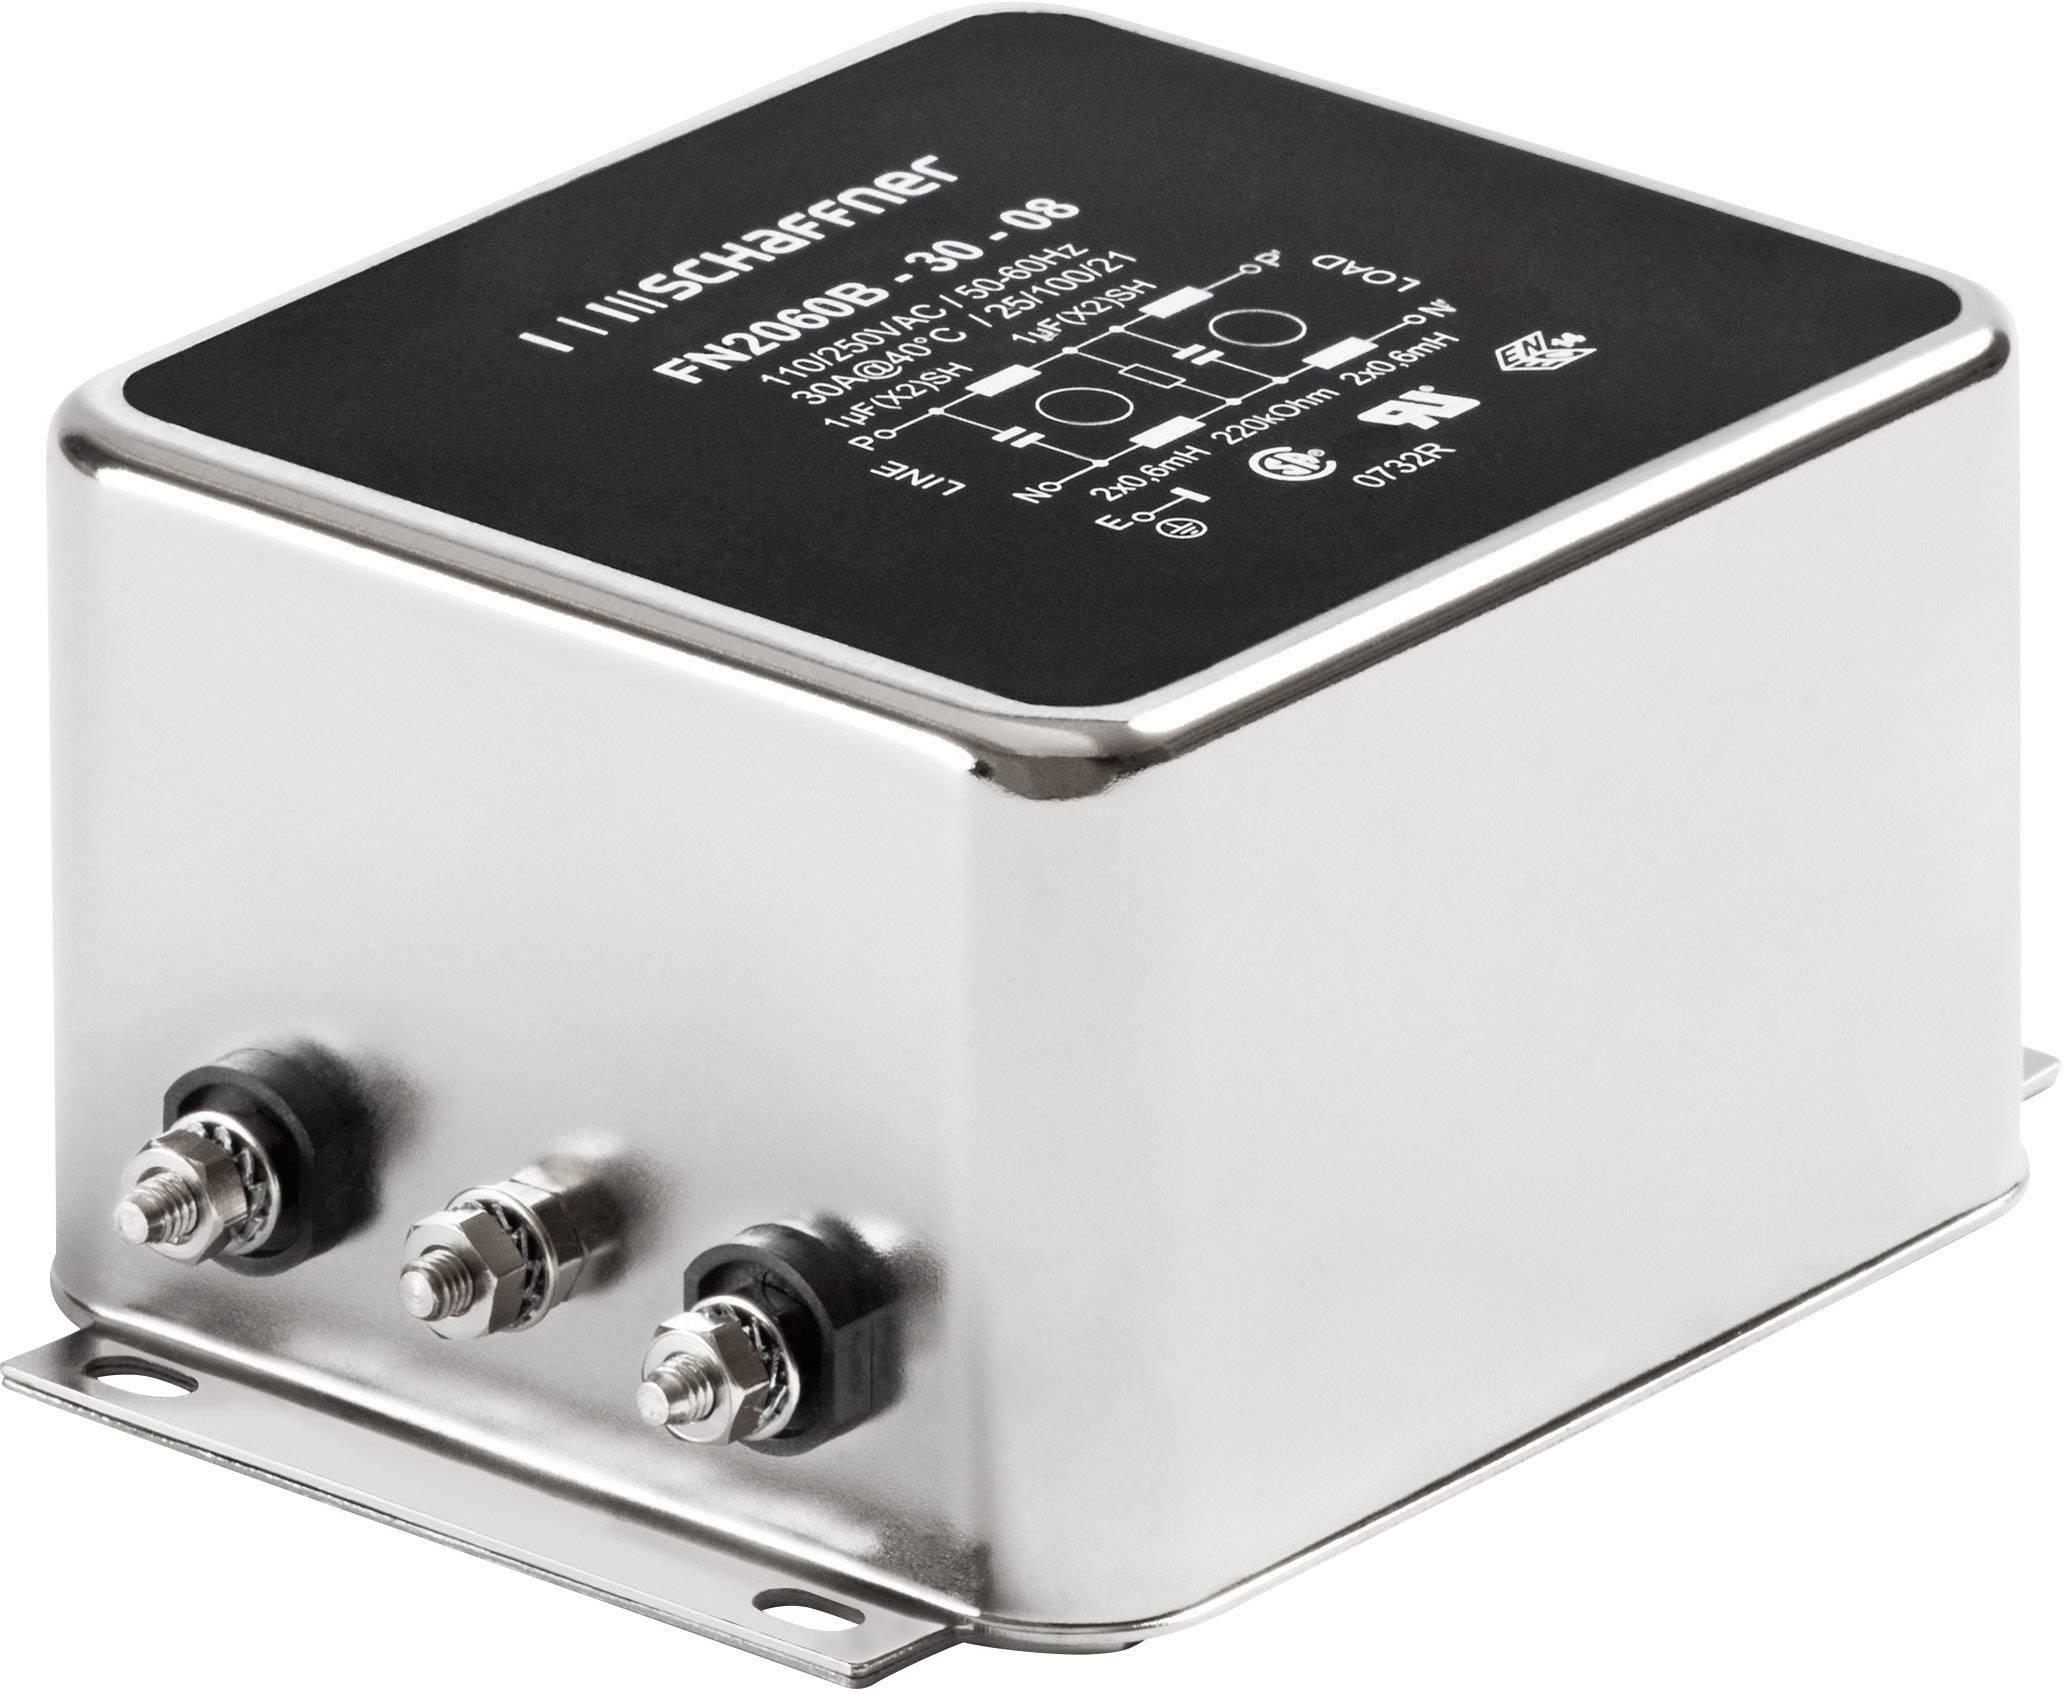 Síťový filtr Schaffner, FN 2060-3-06, 2,5 mH, 250 V/AC, 3 A